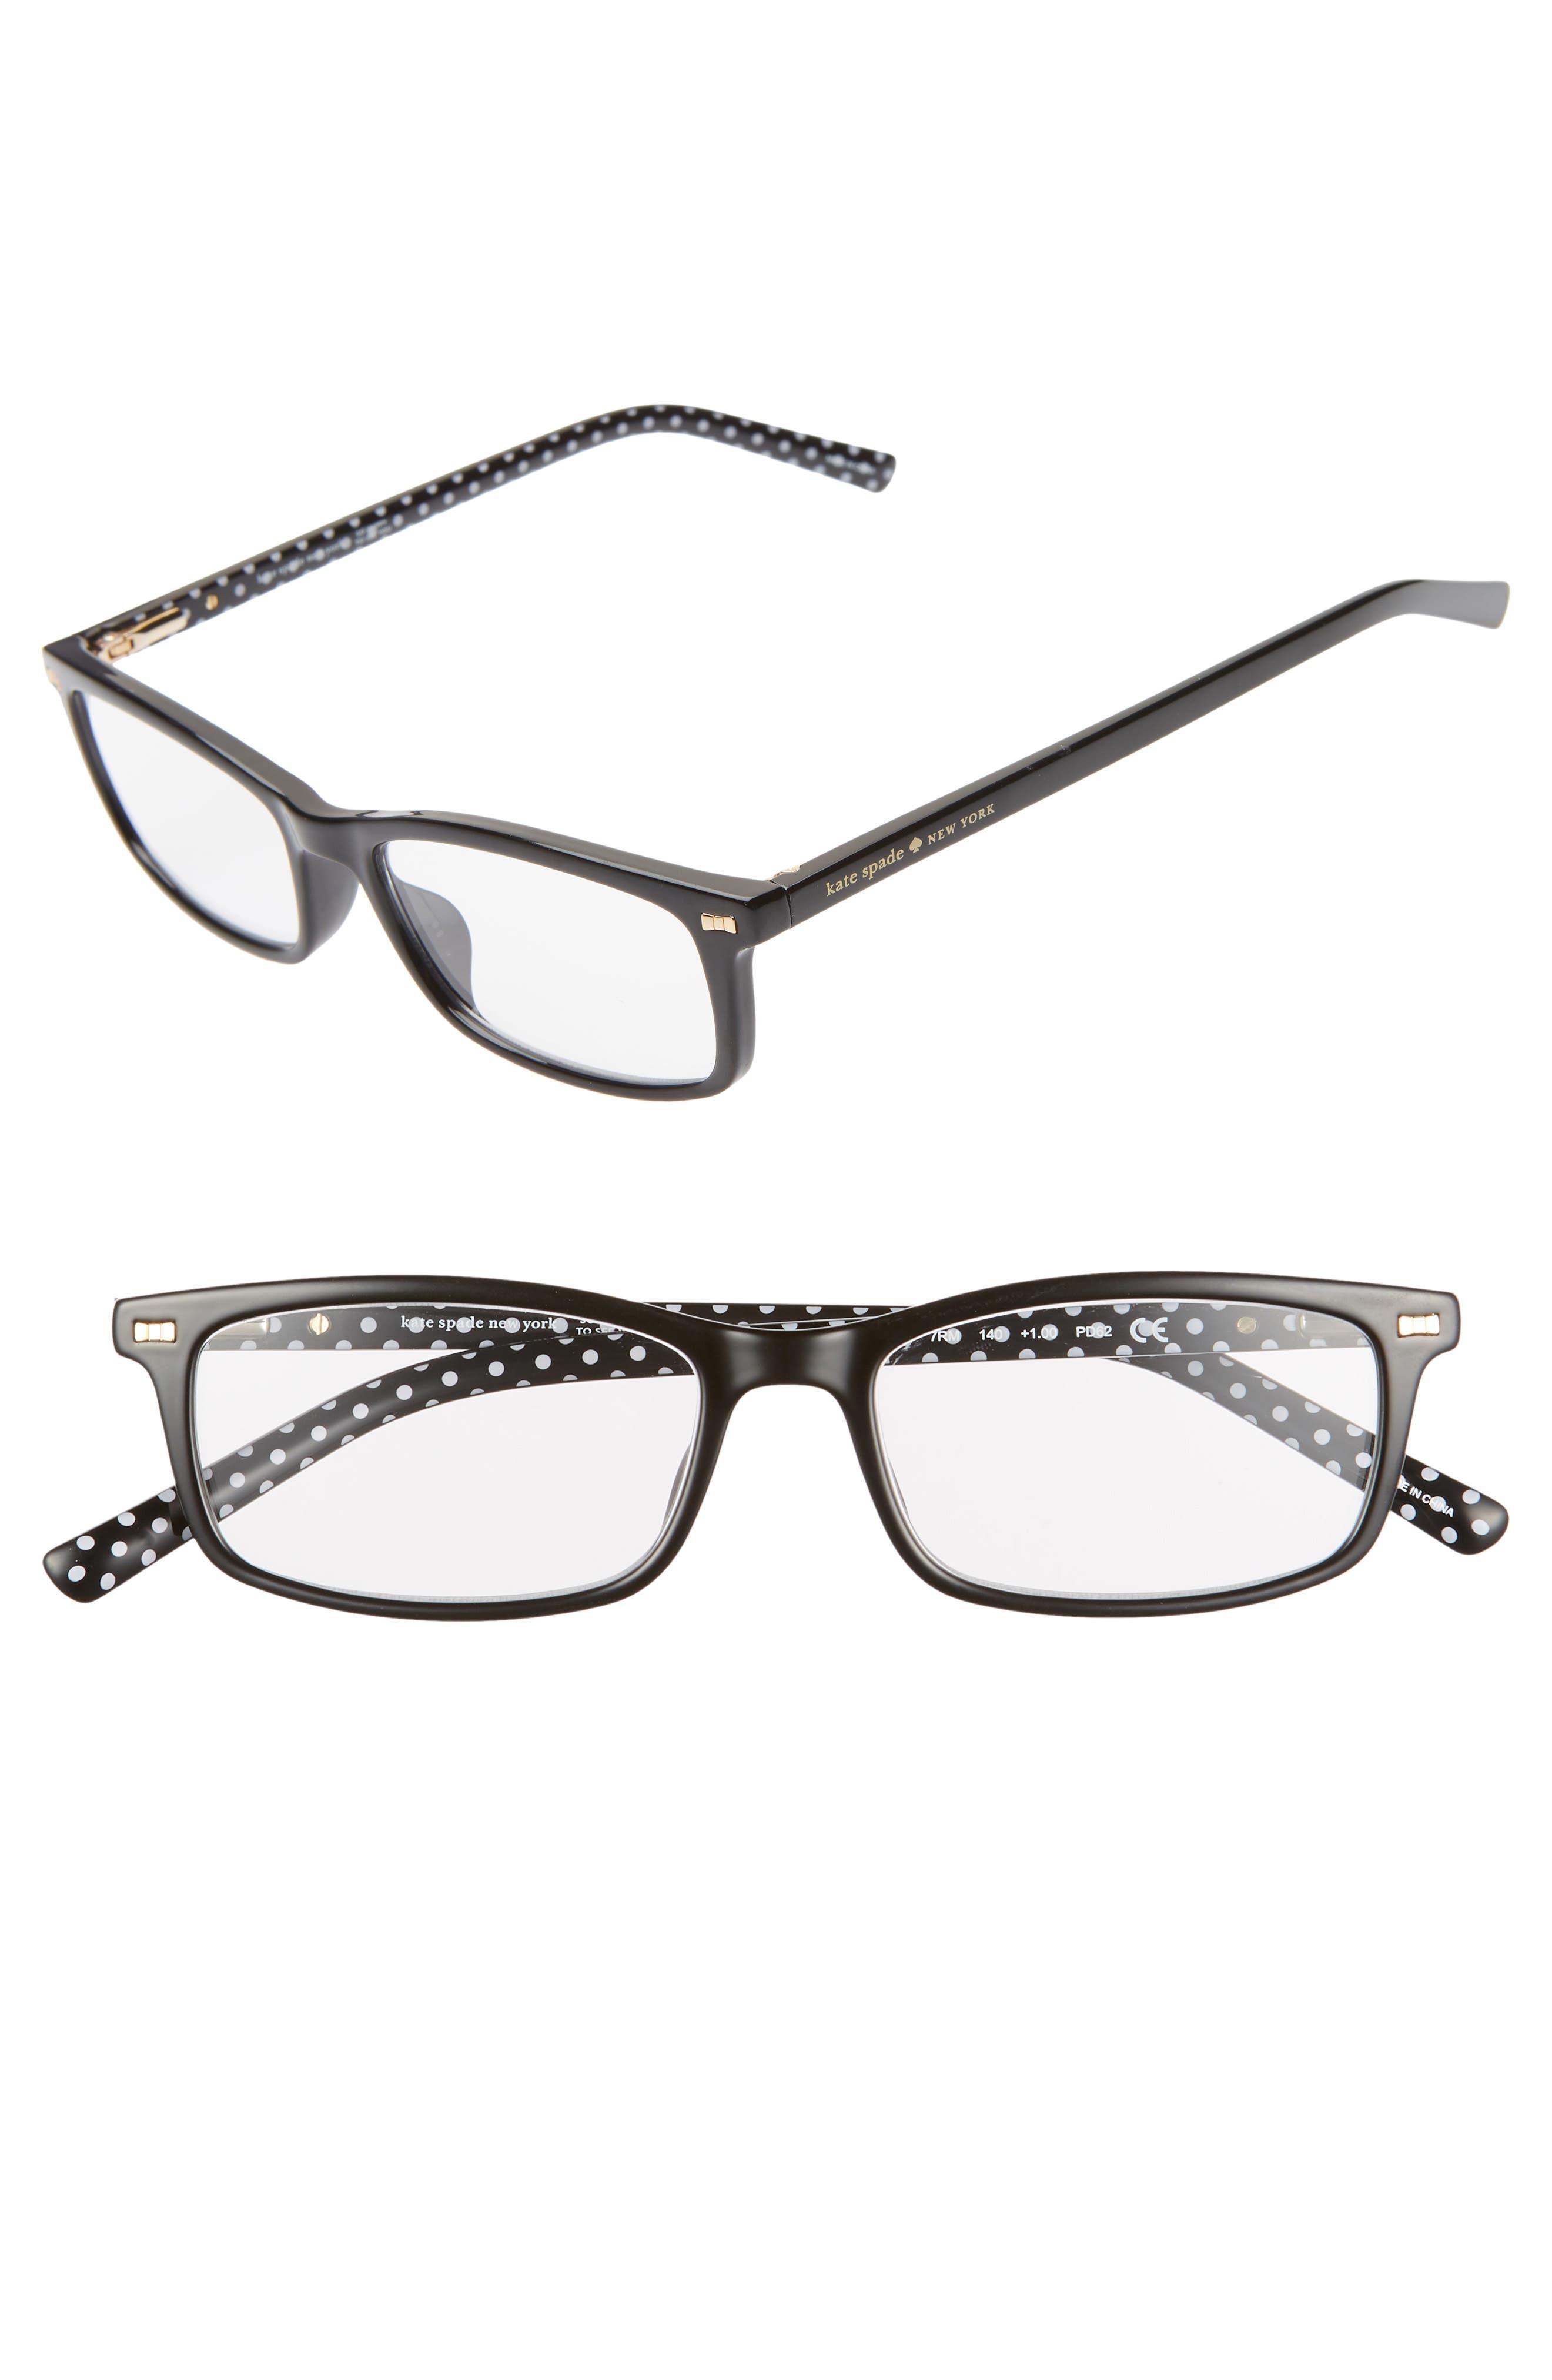 KATE SPADE NEW YORK, jodie 50mm rectangular reading glasses, Main thumbnail 1, color, BLACK POLKA DOT